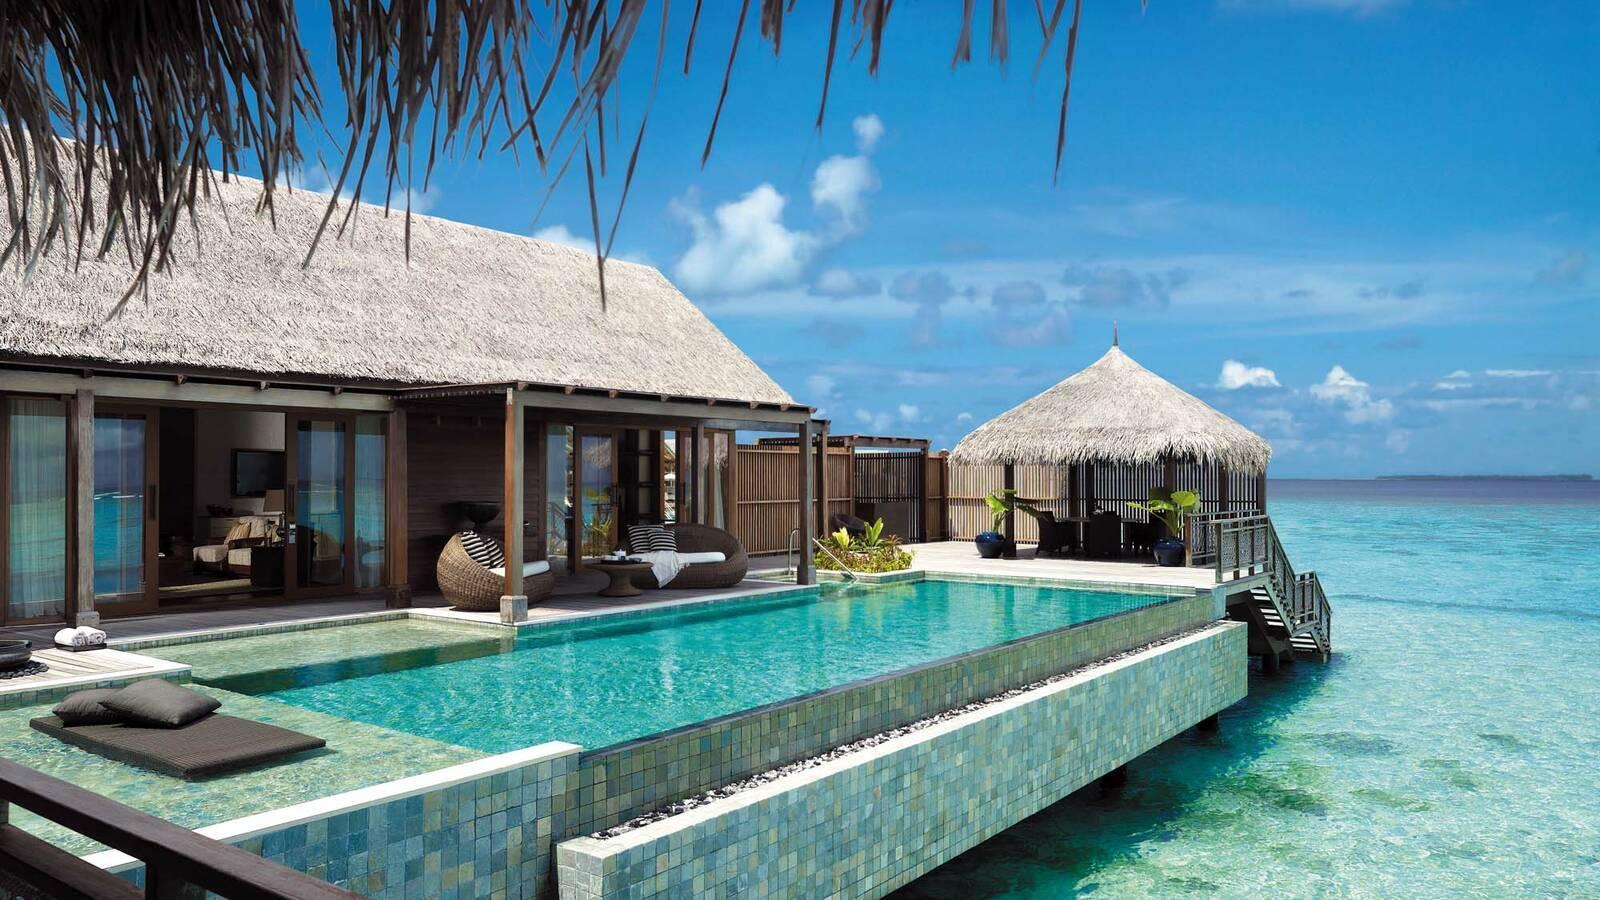 Shangri La Villingili Villa Muthee Piscine Maldives